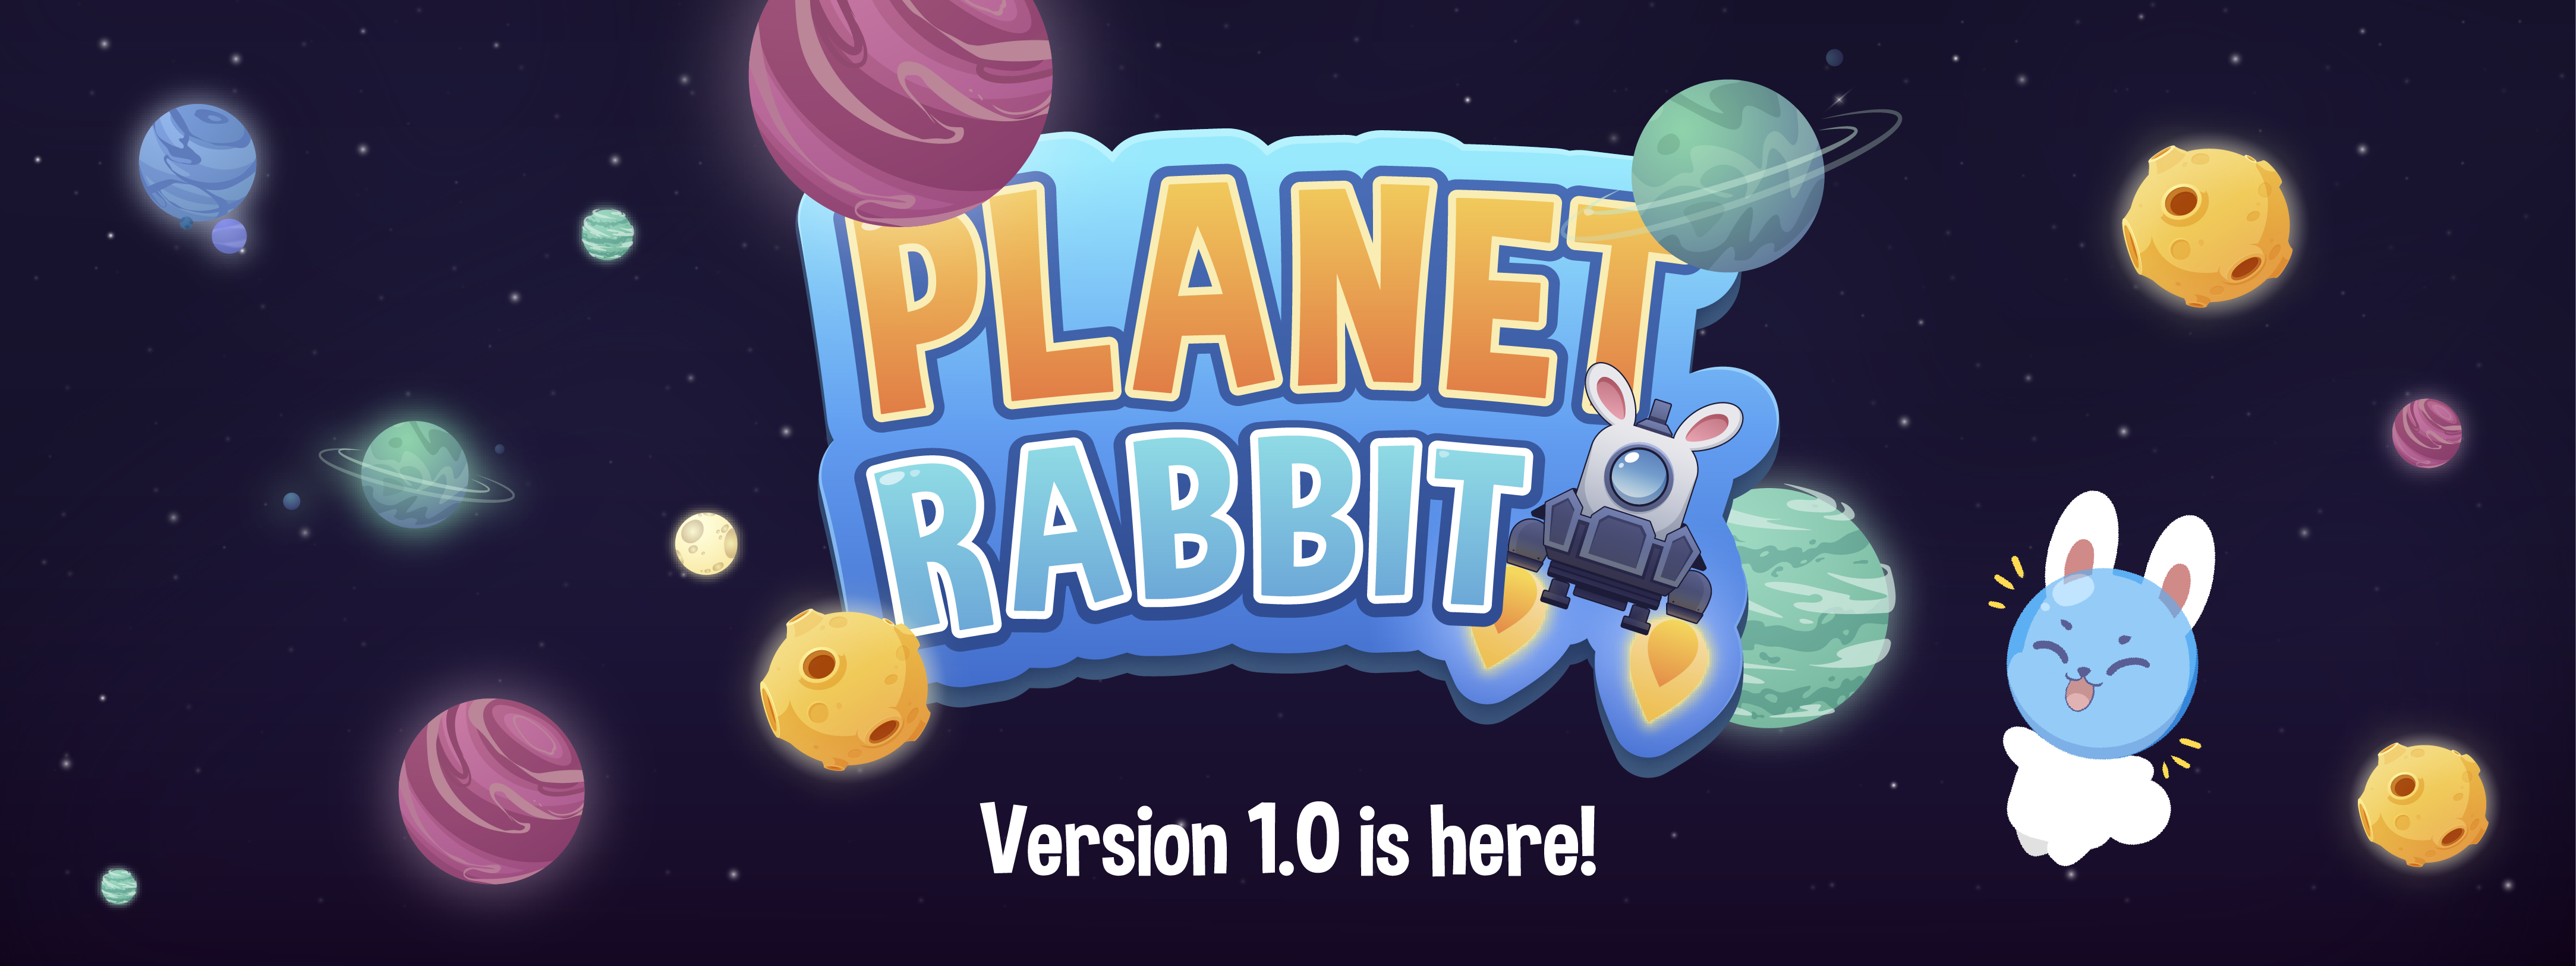 Planet Rabbit